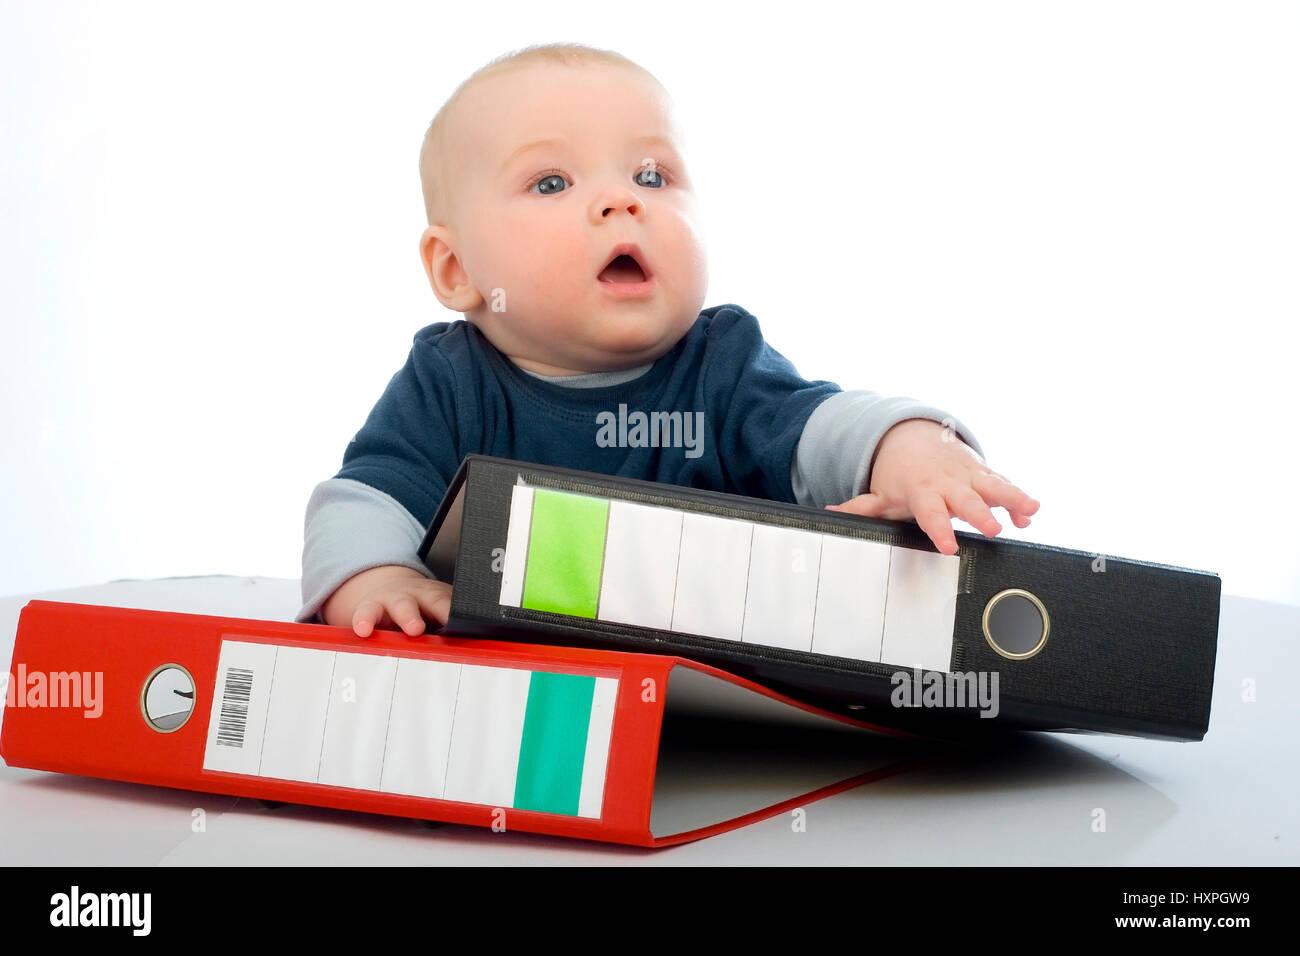 6-year-old boy with files (mr), sechsjähriger Junge mit Aktenordnern (mr) - Stock Image